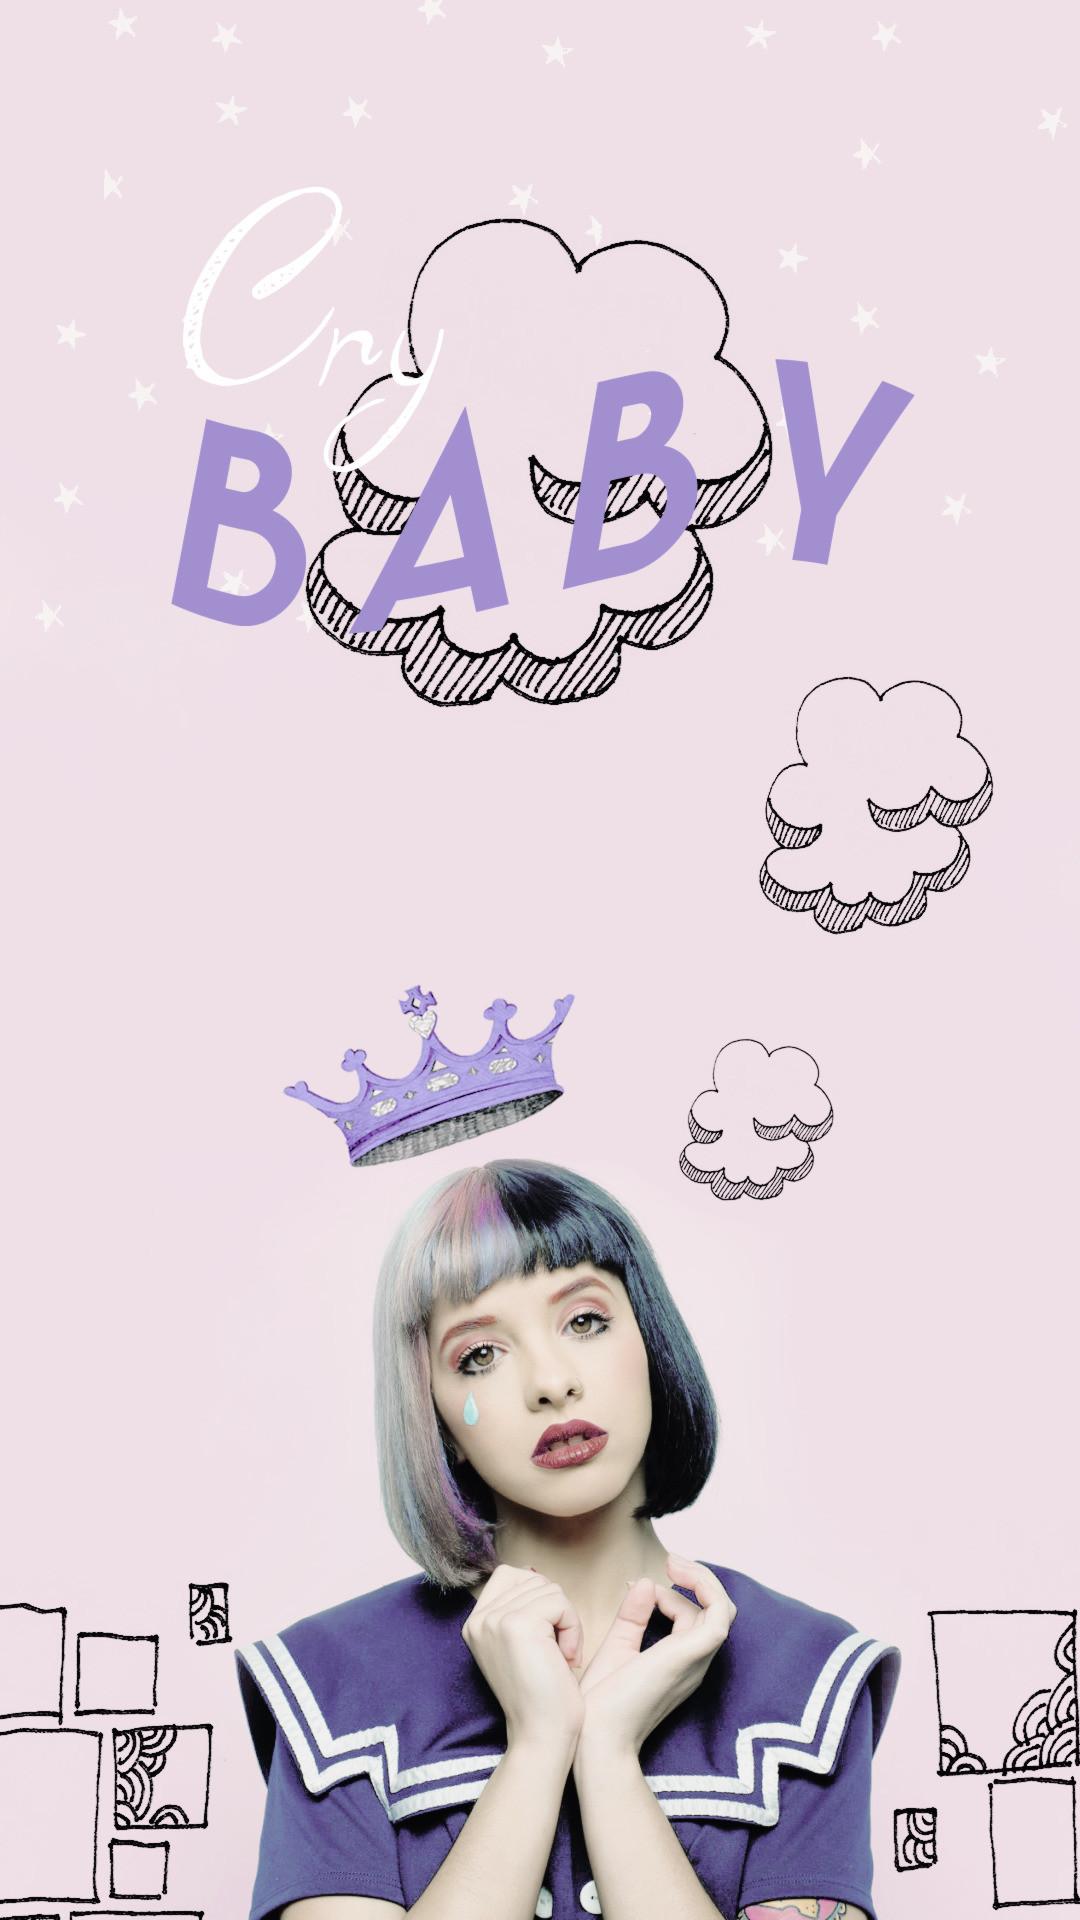 CryBaby — Melanie Martinez – Lock Screen Wallpaper